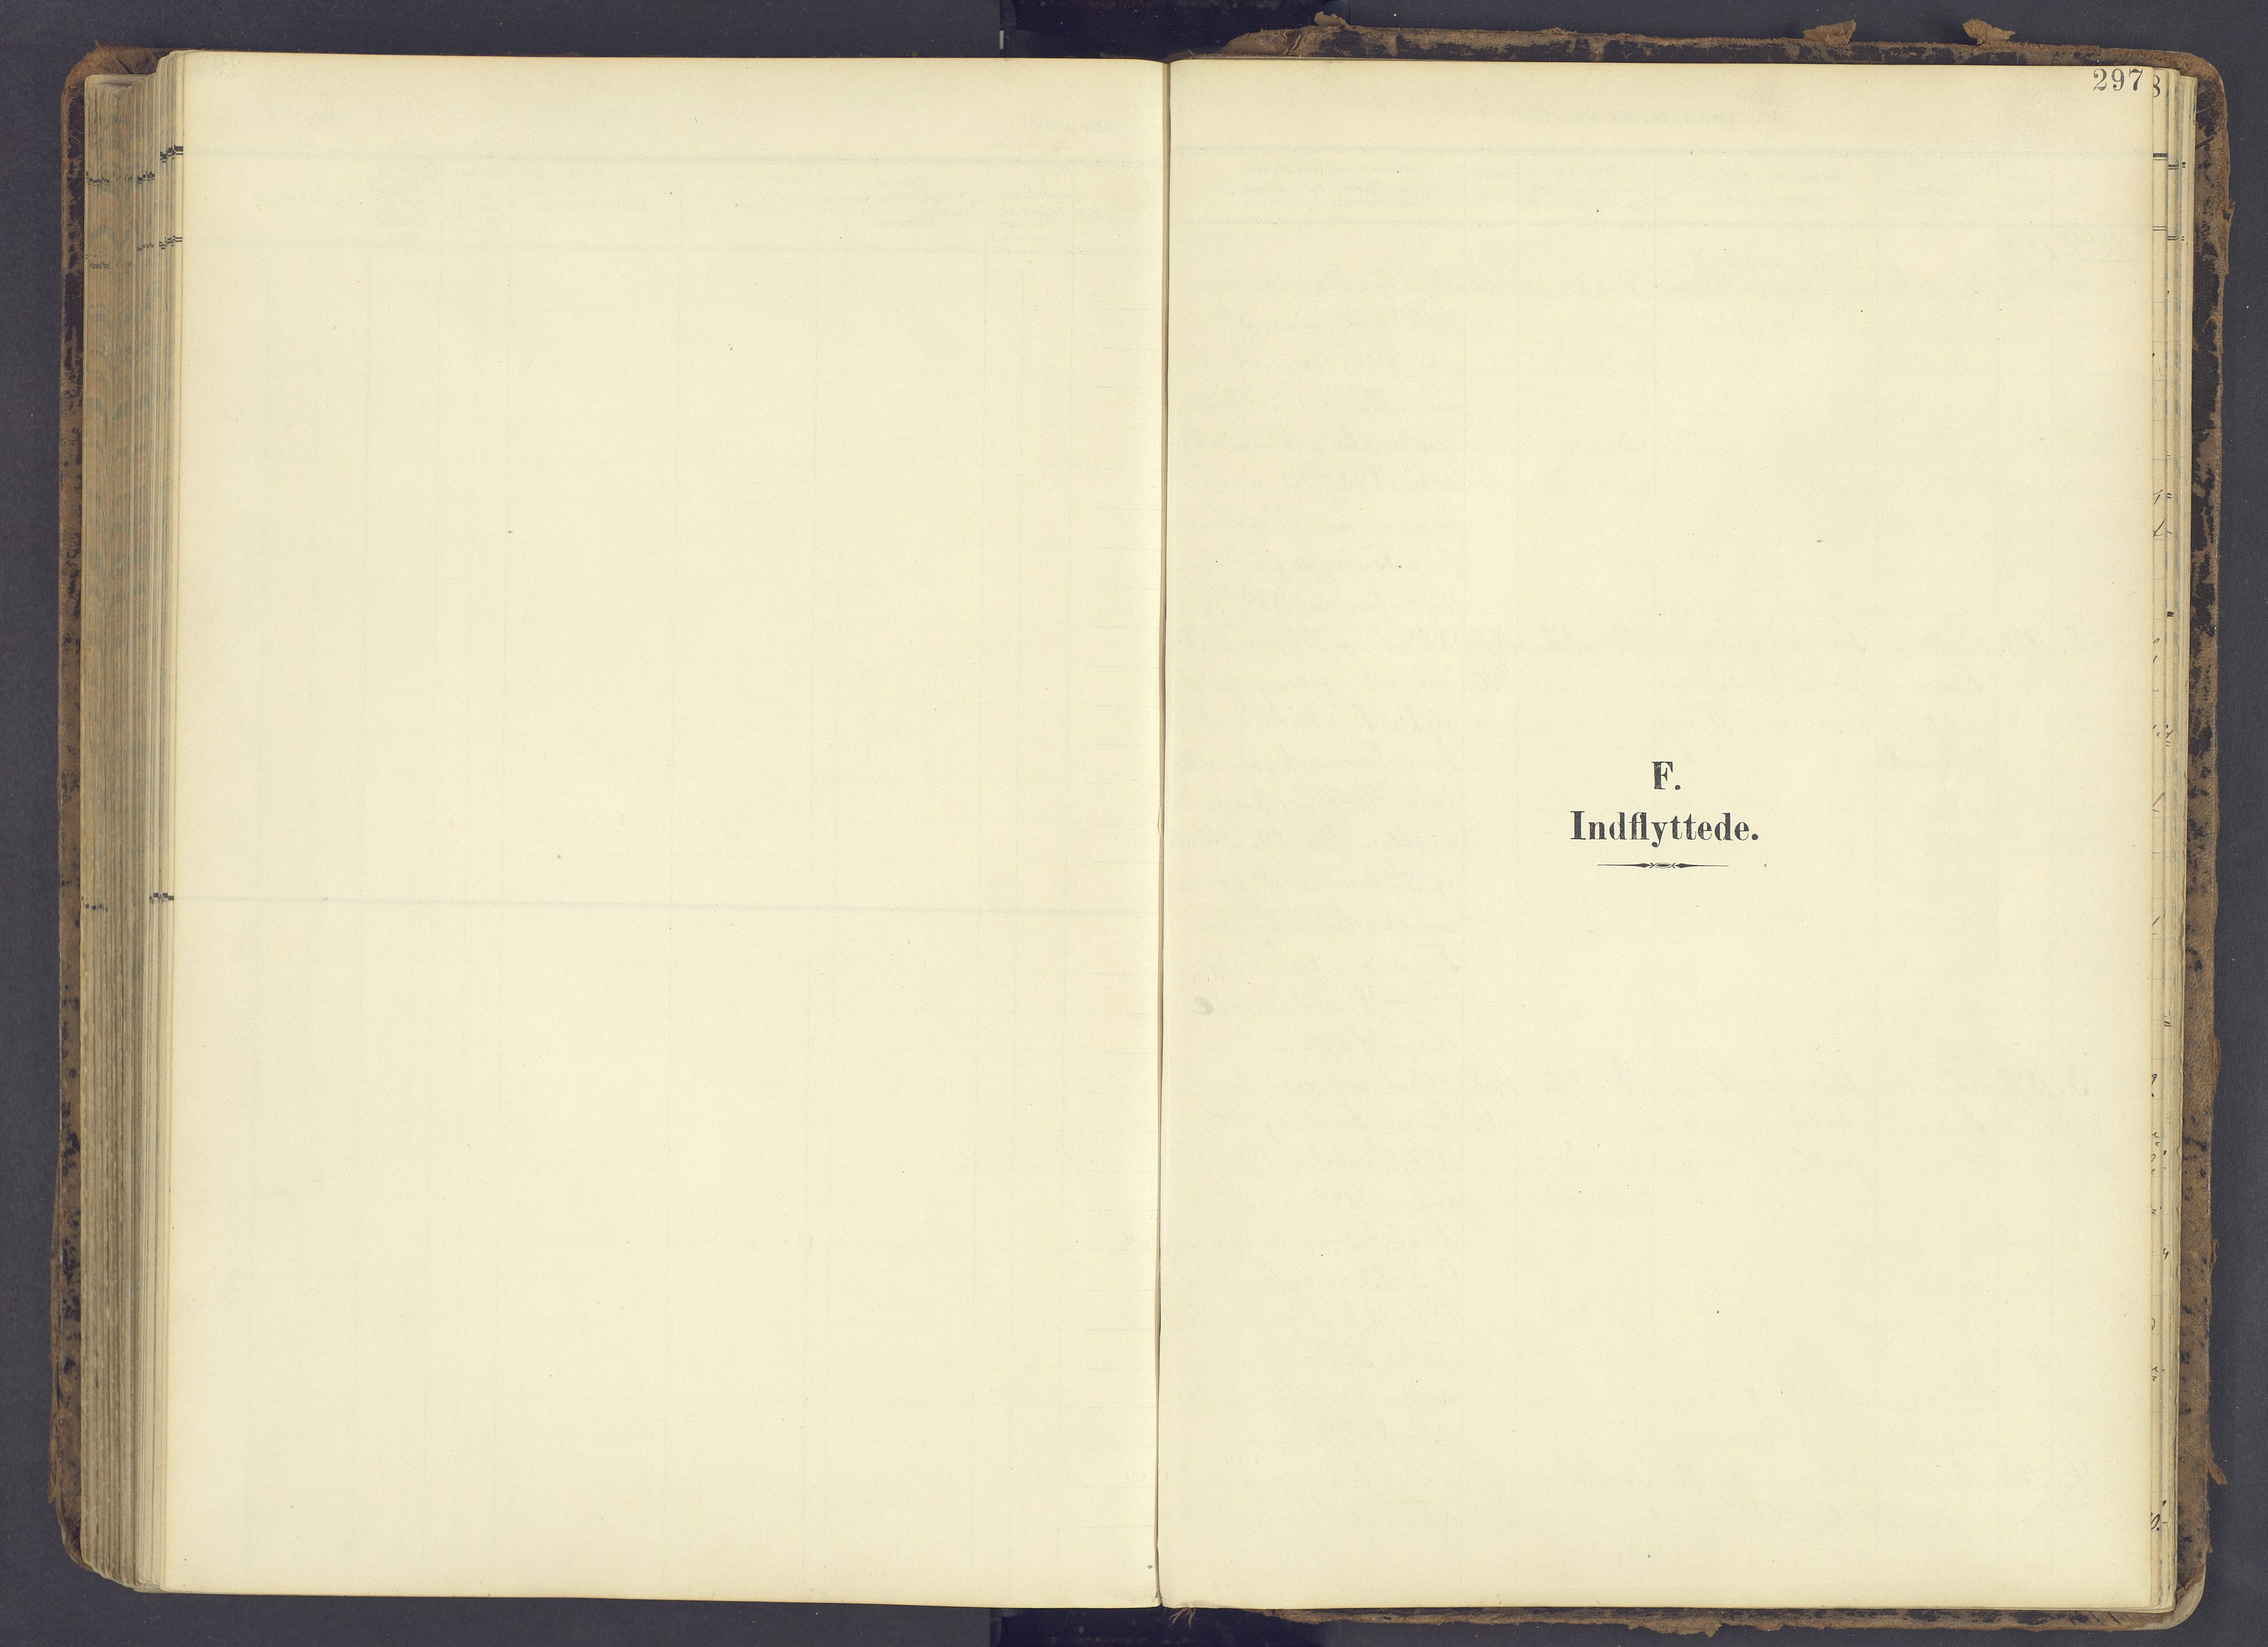 SAH, Fåberg prestekontor, Ministerialbok nr. 12, 1899-1915, s. 297